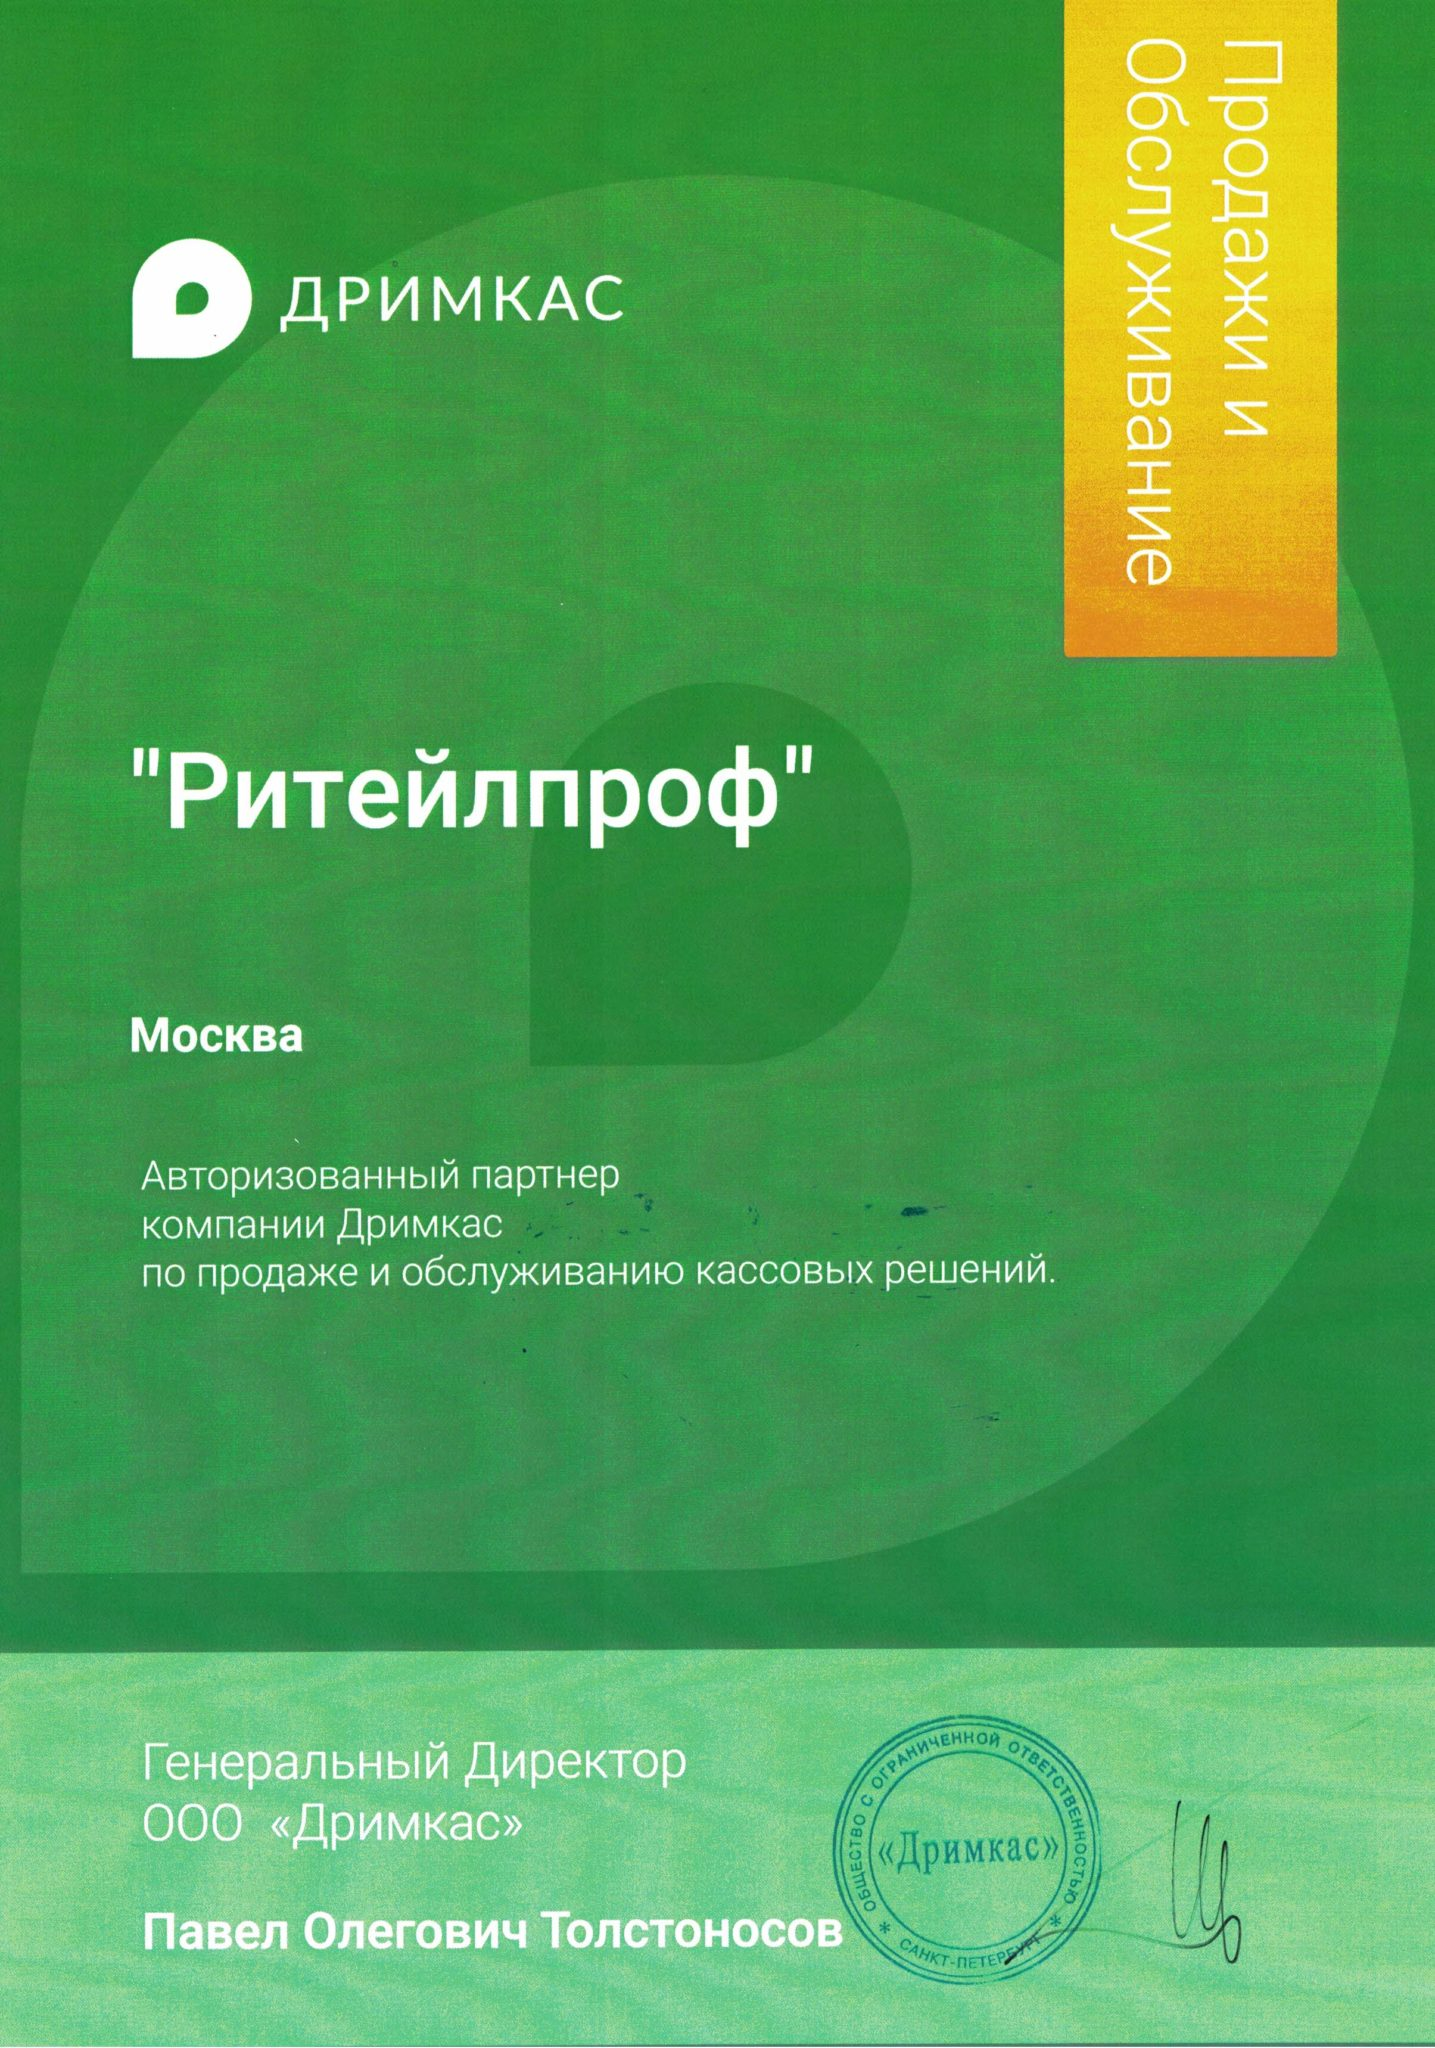 Сертификат Дримкас